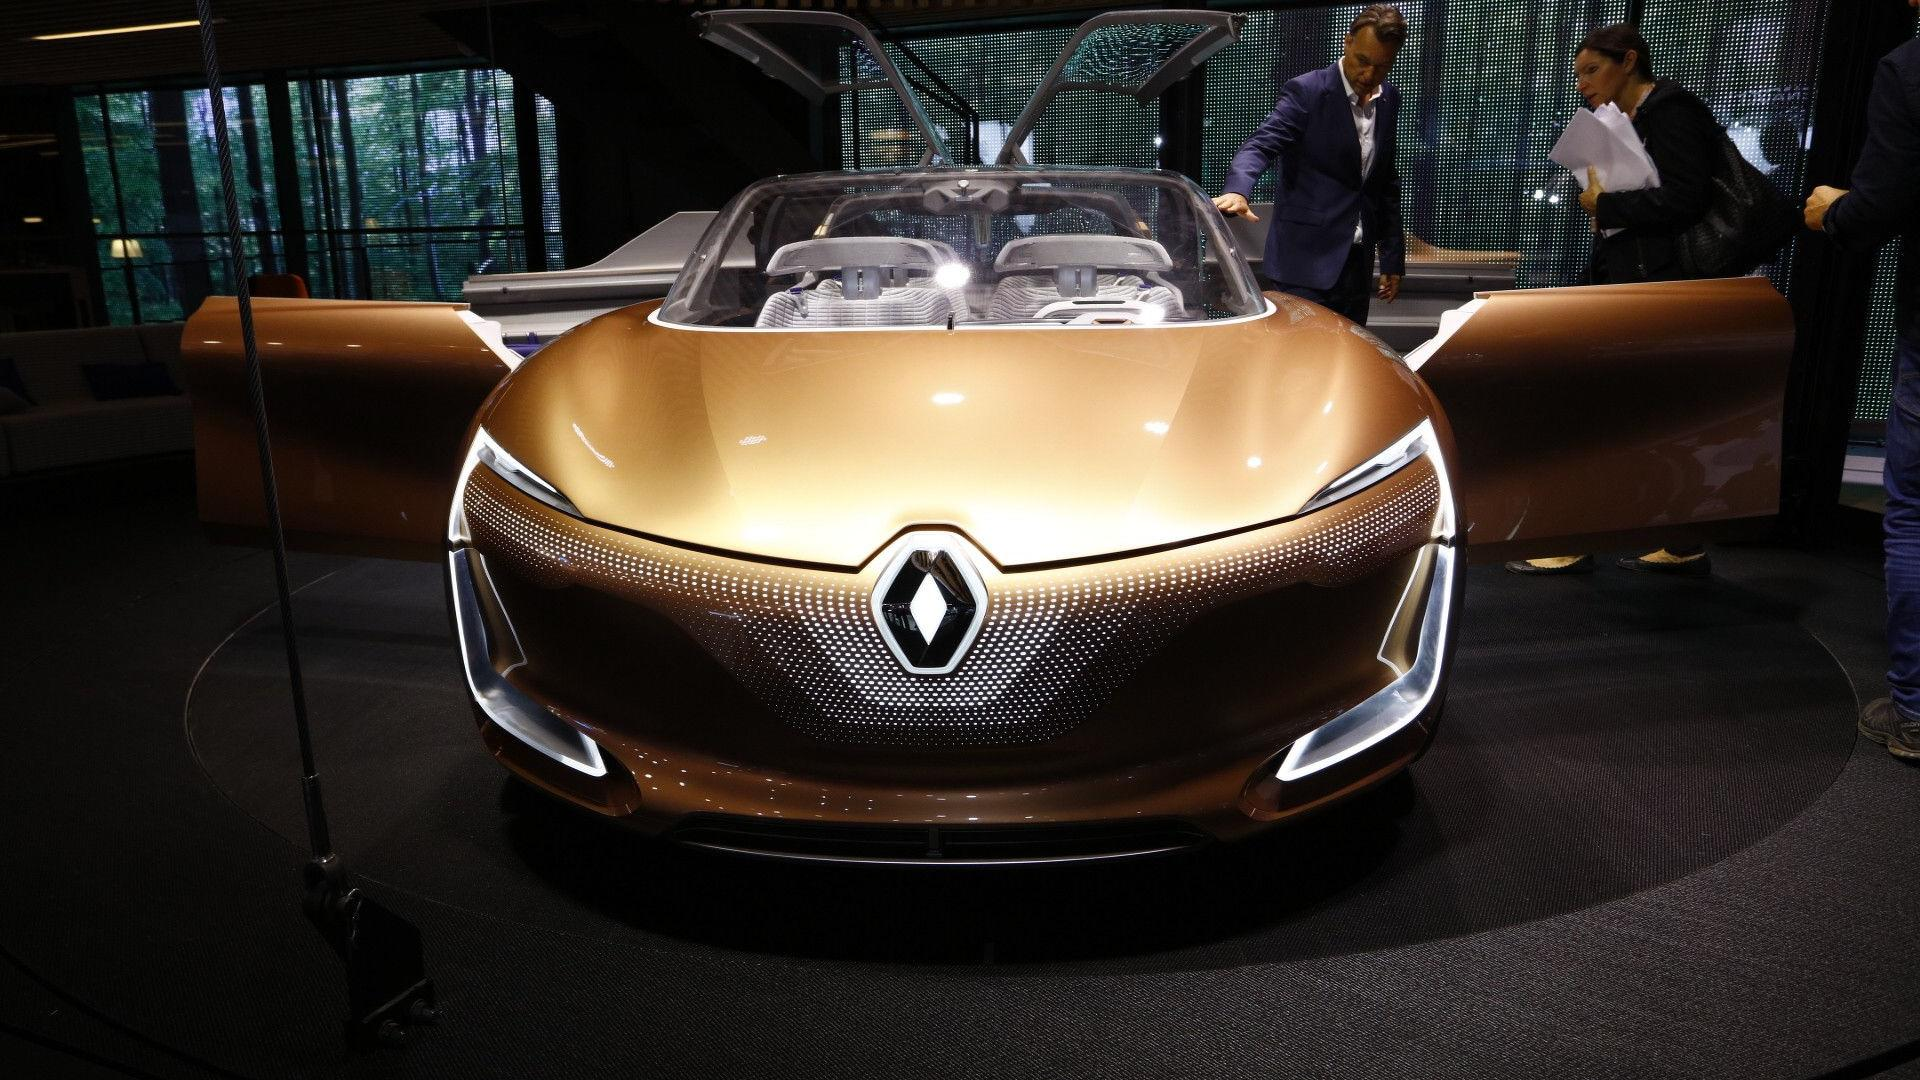 5a50caff53400 renault symbioz concept live in frankfurt رنو کریو جدید در نمایشگاه اتومبیل پاریس رونمایی میشود   اجاره ماشین